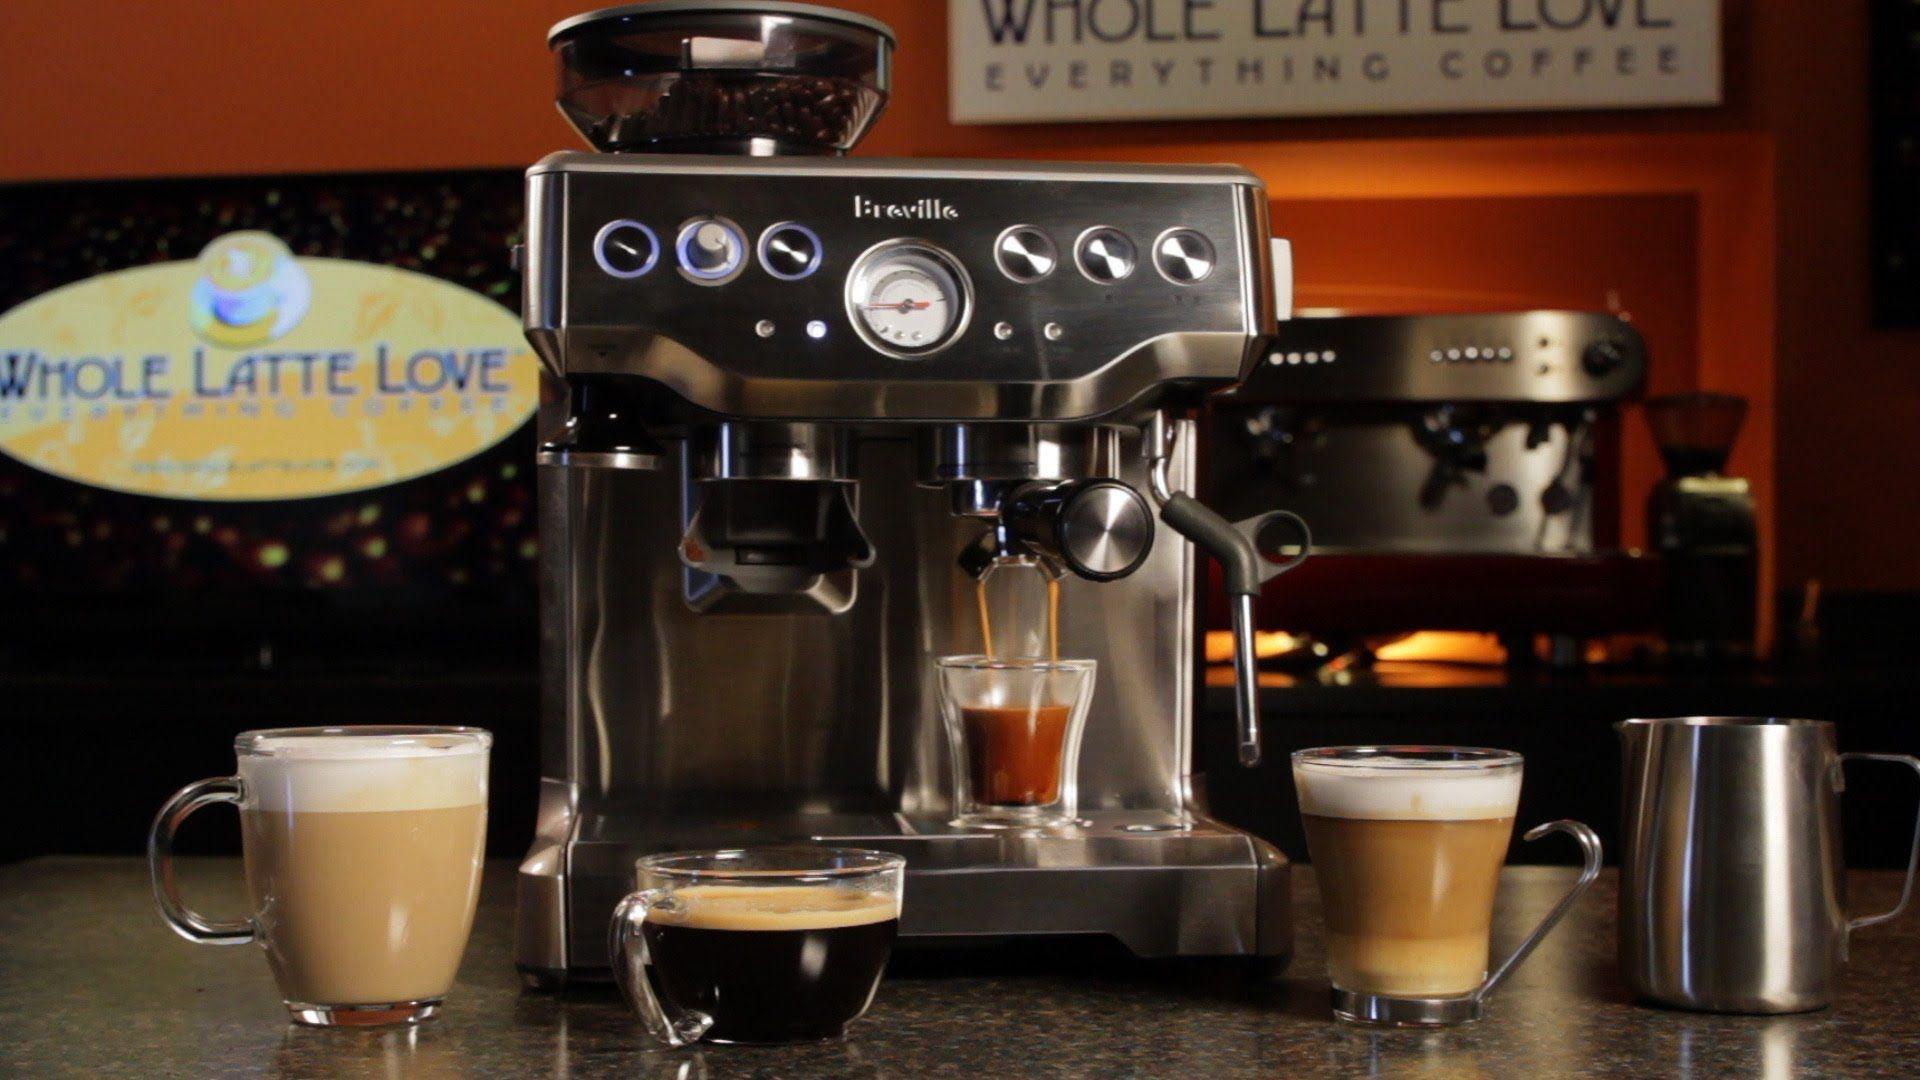 Breville barista express bes870xl semiautomatic espresso